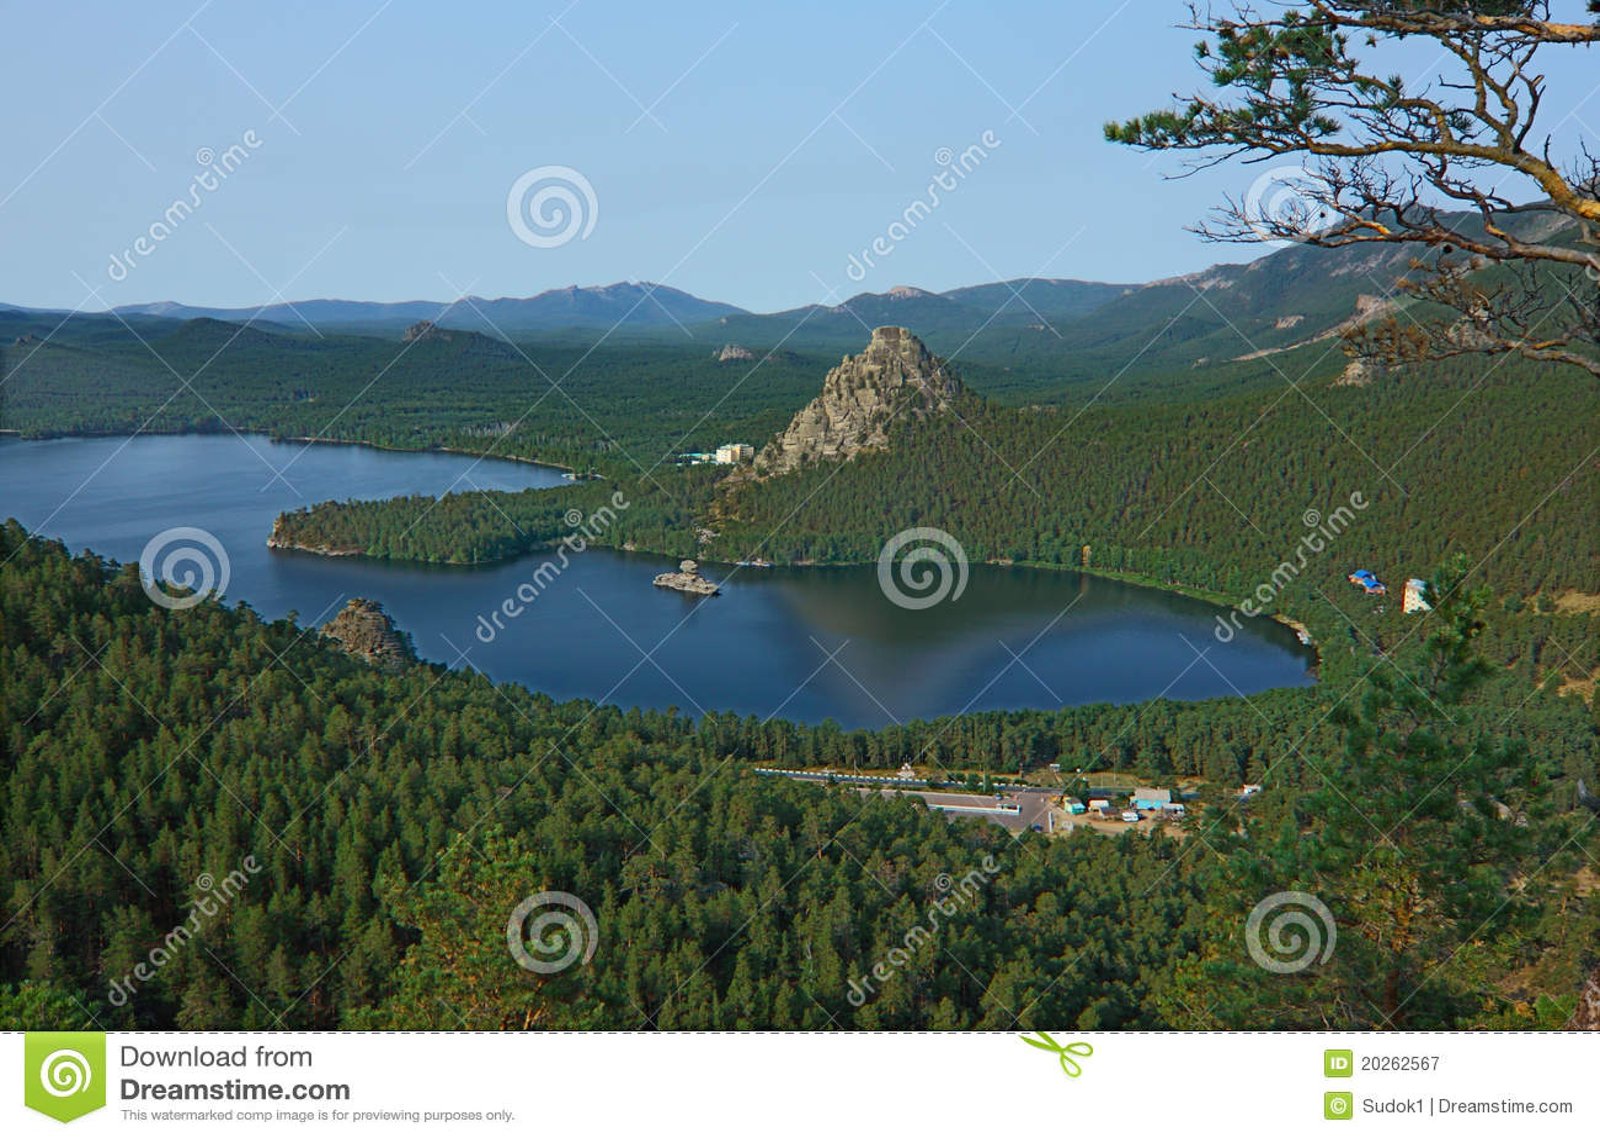 Borovoe Kazakhstan  city photos : Lac Borovoe. Kazakhstan Photographie stock libre de droits Image ...